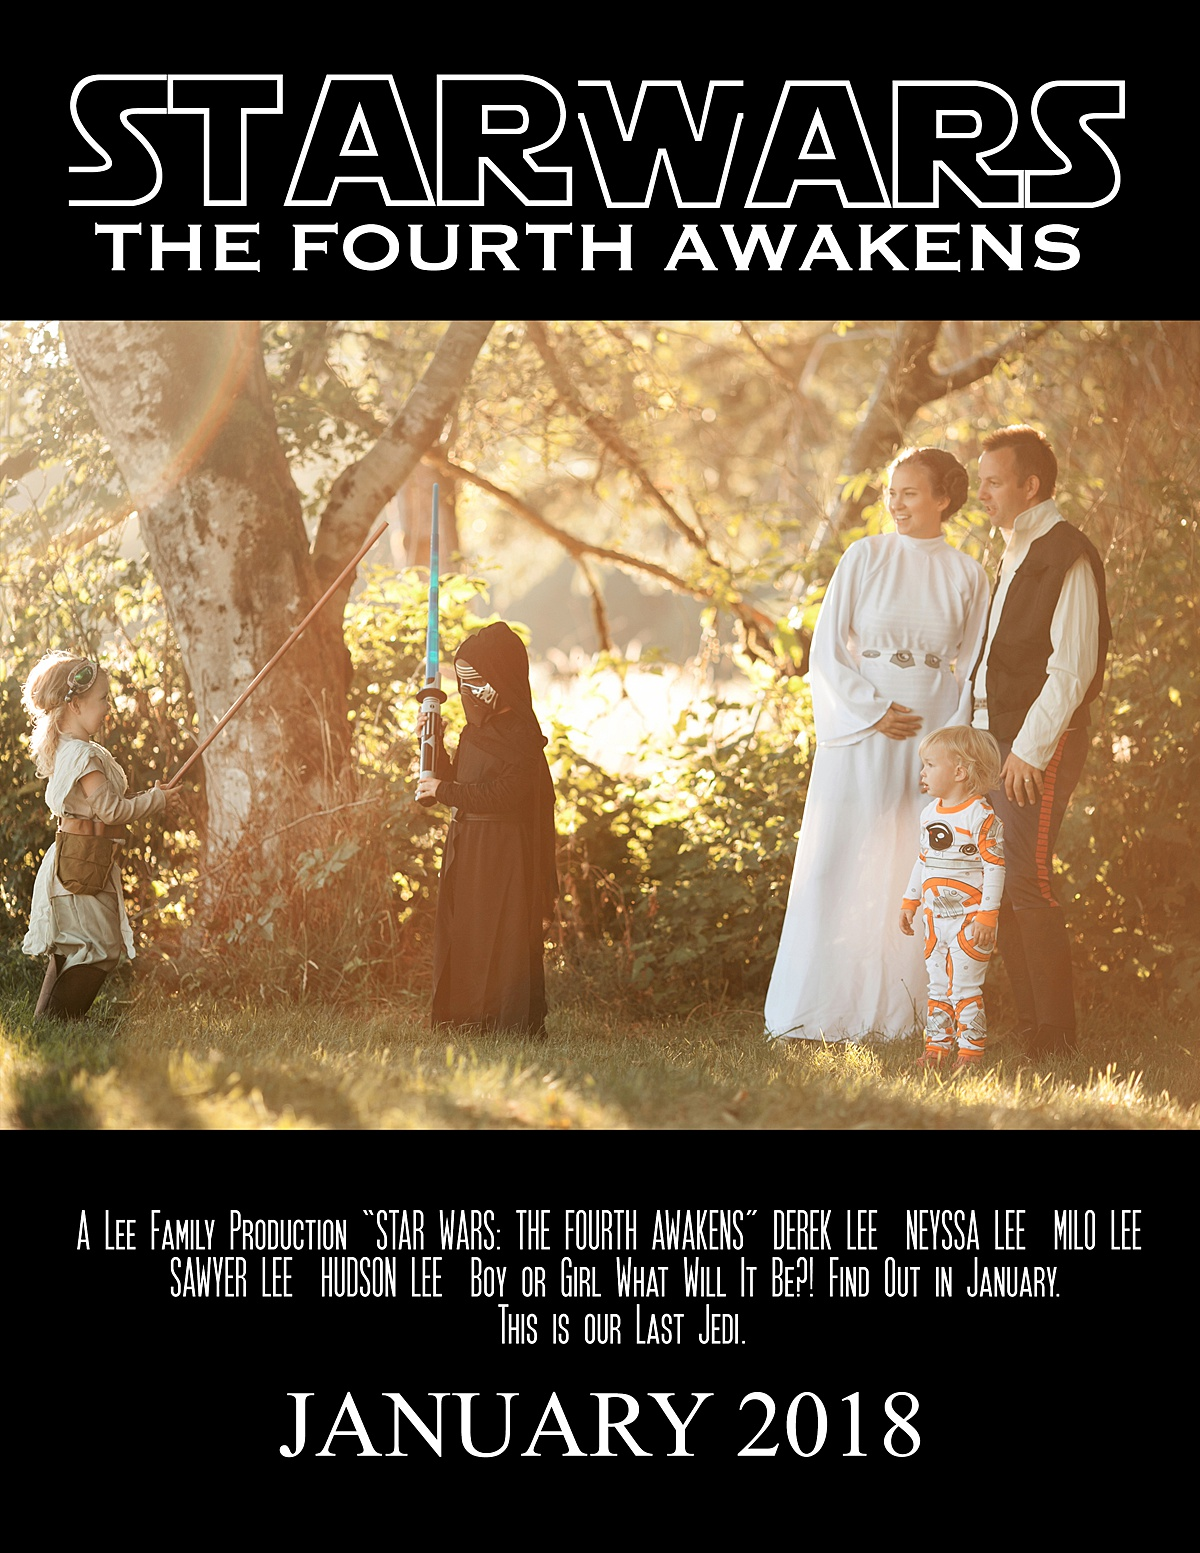 Star Wars Pregnancy Announcement, baby 4, movie poster